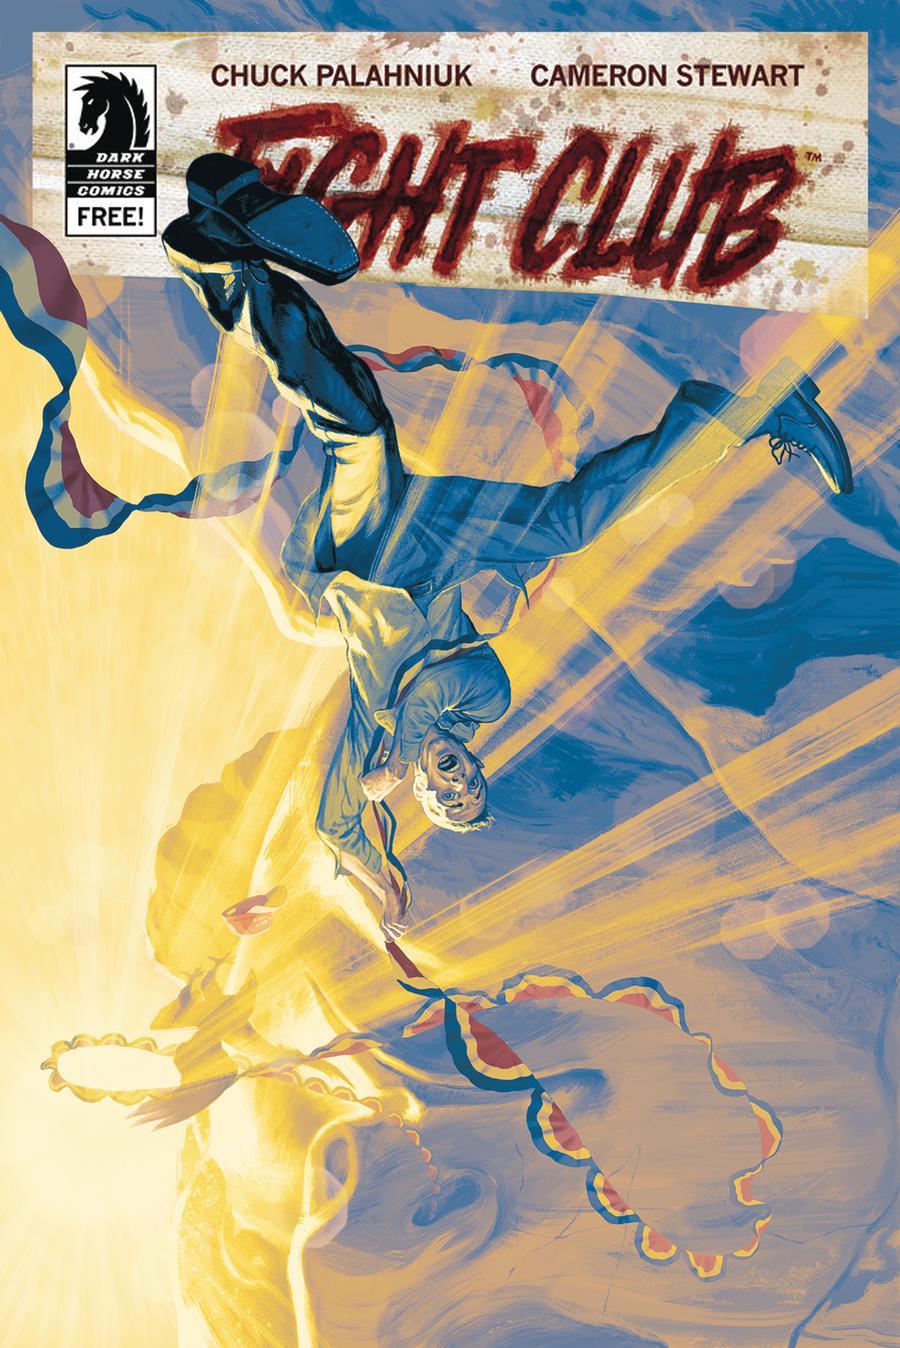 Fight Club 3 #7 Cover B Variant Steve Morris Cover